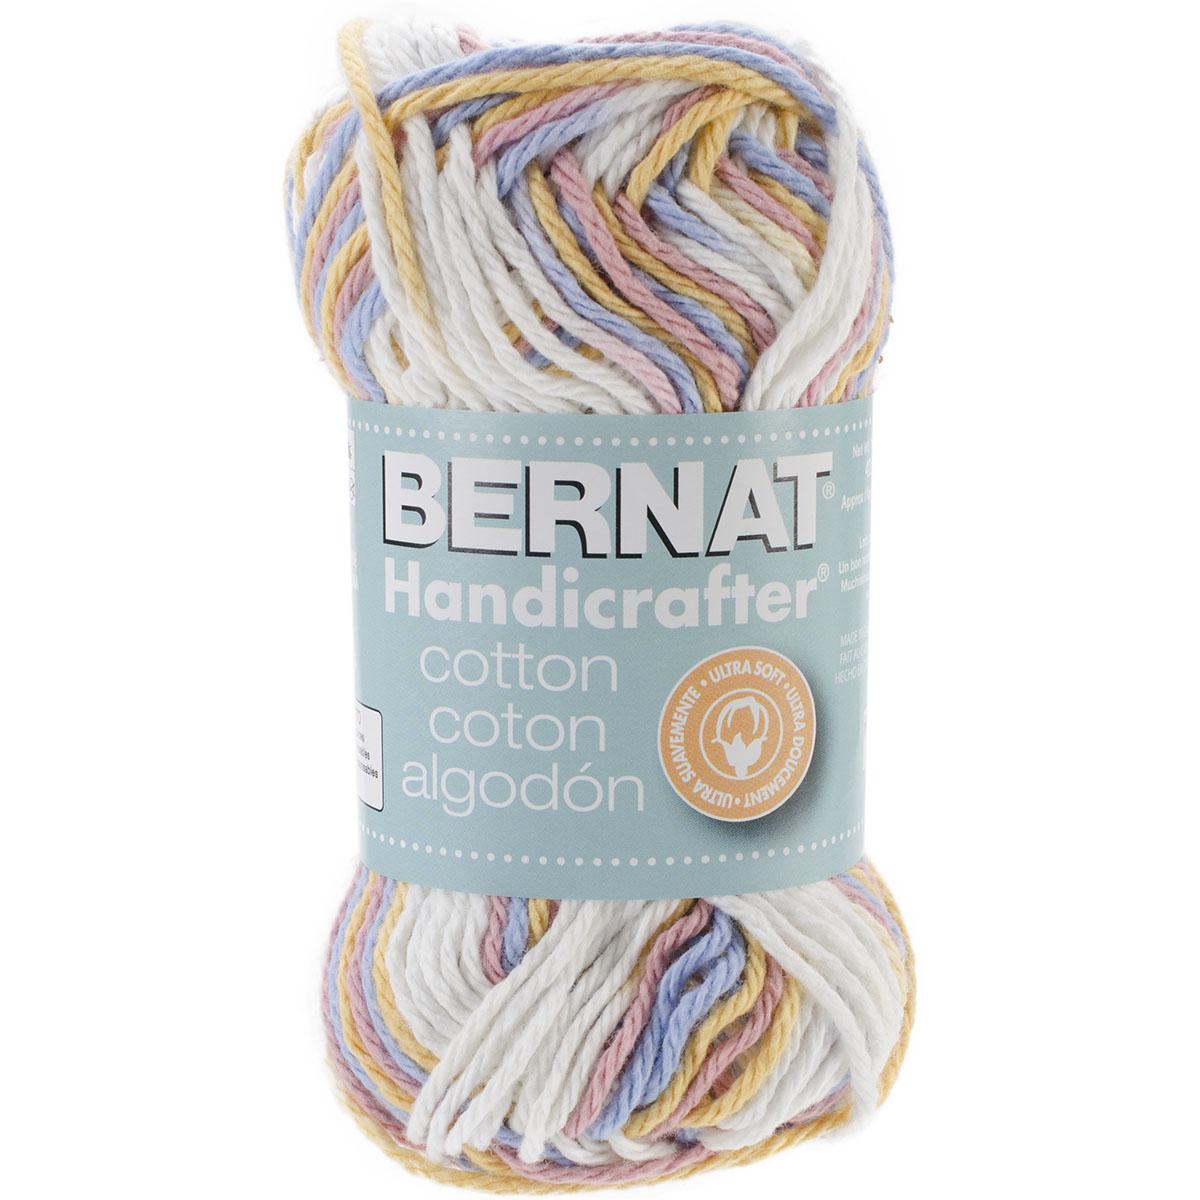 Handicrafter Cotton Yarn Ombres & Prints-Kitchen Breeze